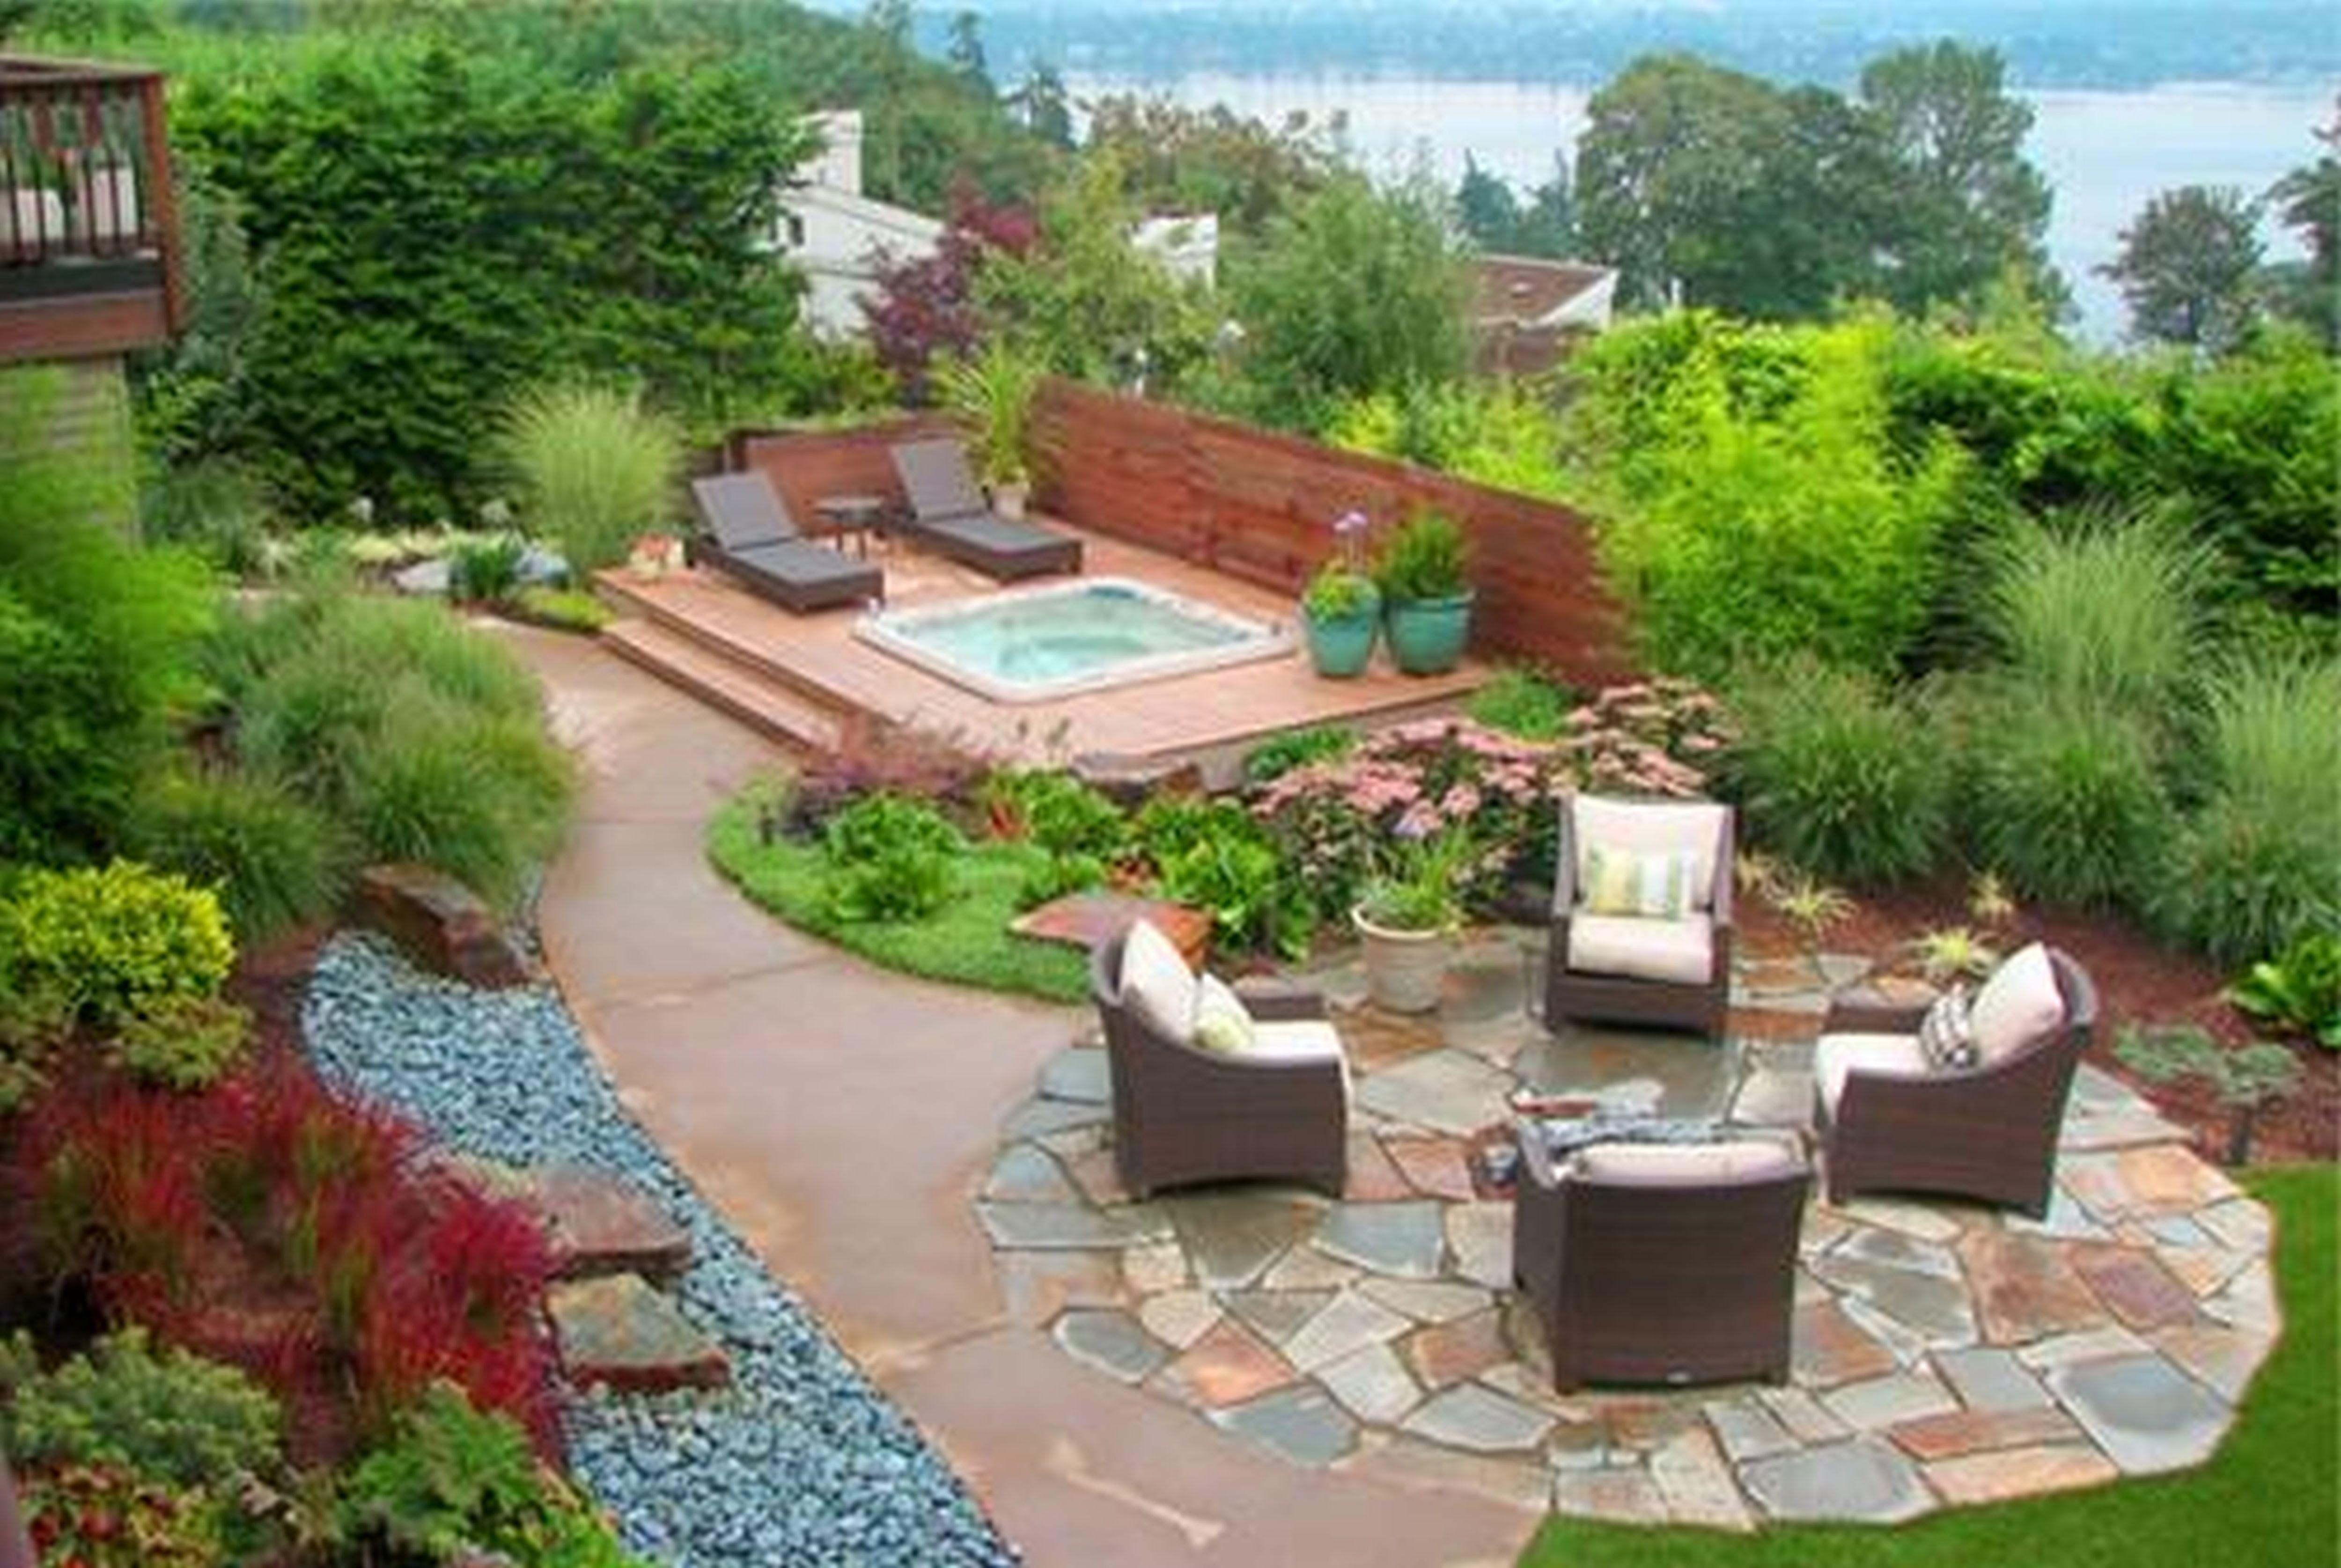 Backyard Landscape Designs Backyard Landscape Design App Choose Your Backyard L In 2020 With Images Modern Backyard Landscaping Backyard Garden Design Backyard Landscaping Designs